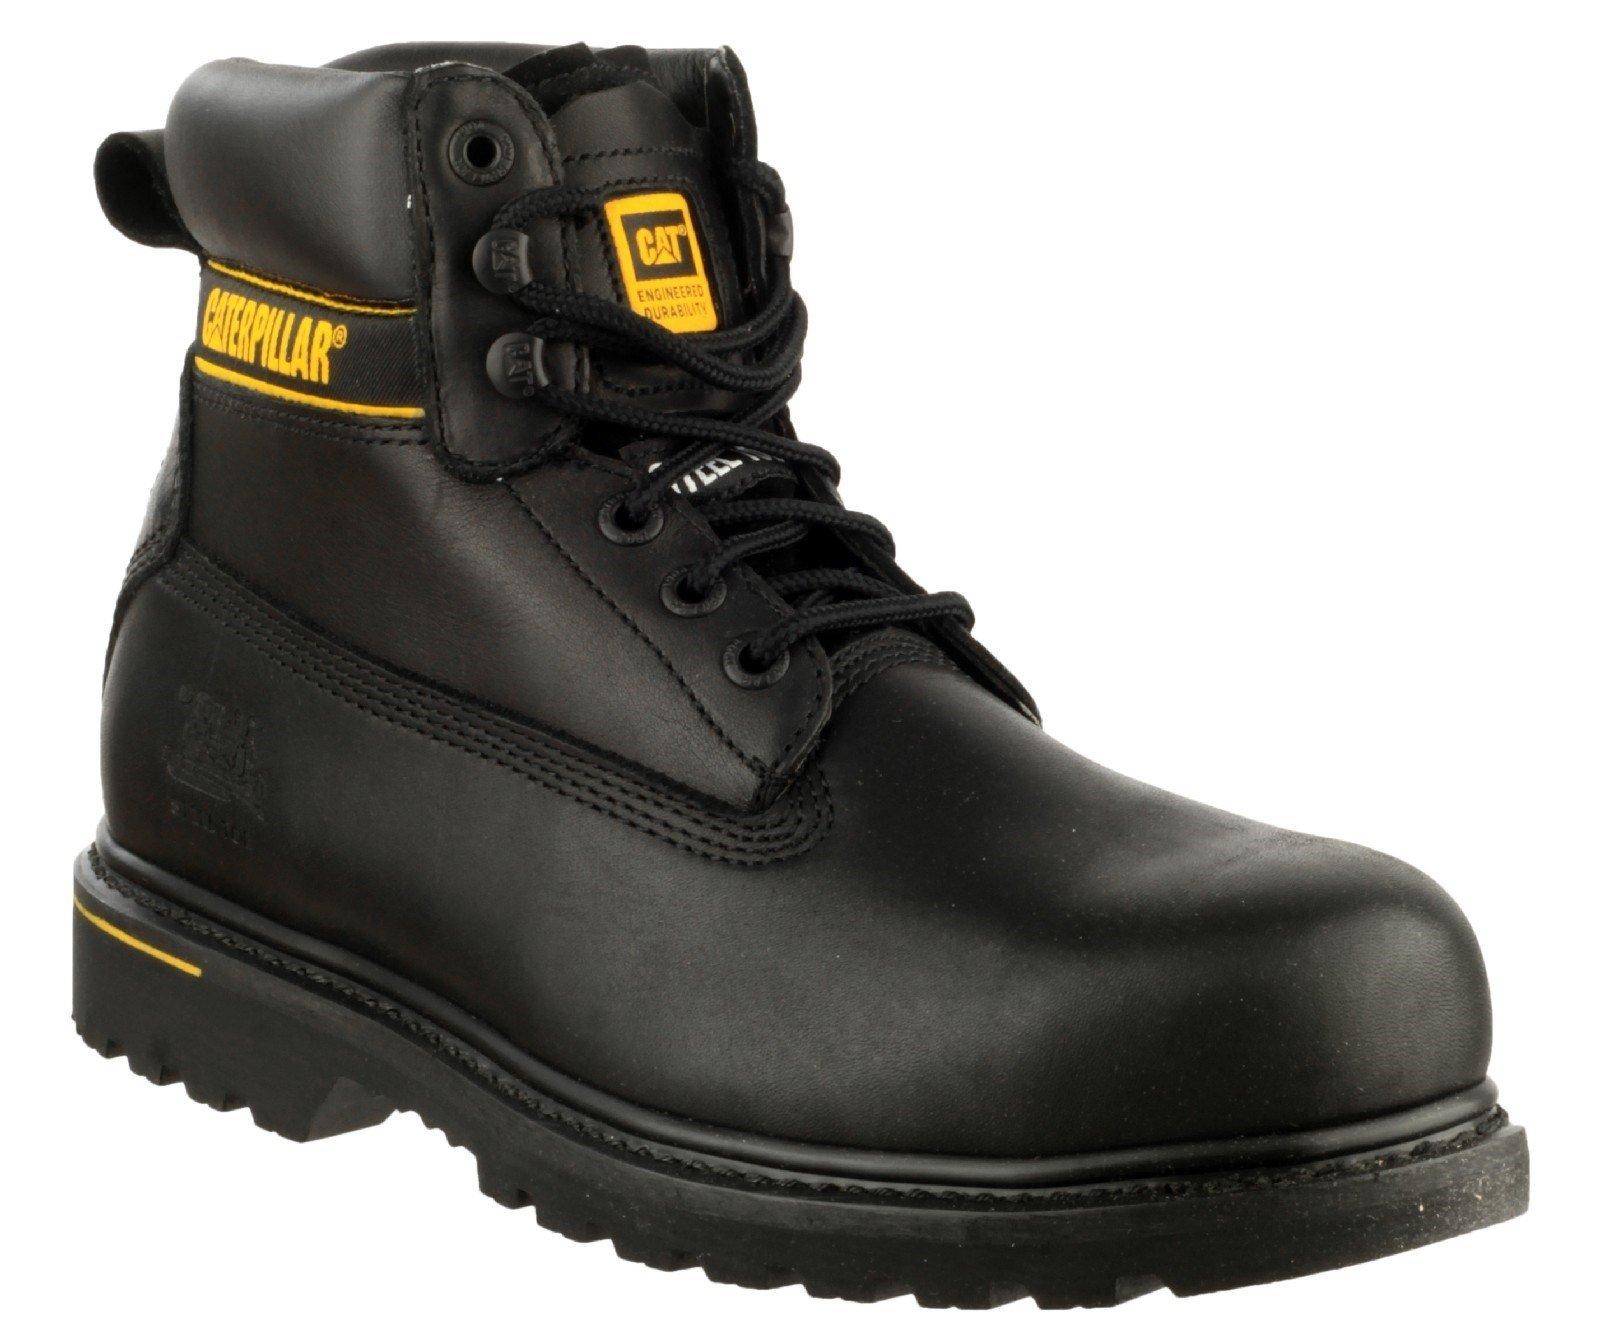 Caterpillar Unisex Holton Safety Boot Black 16105 - Black 14